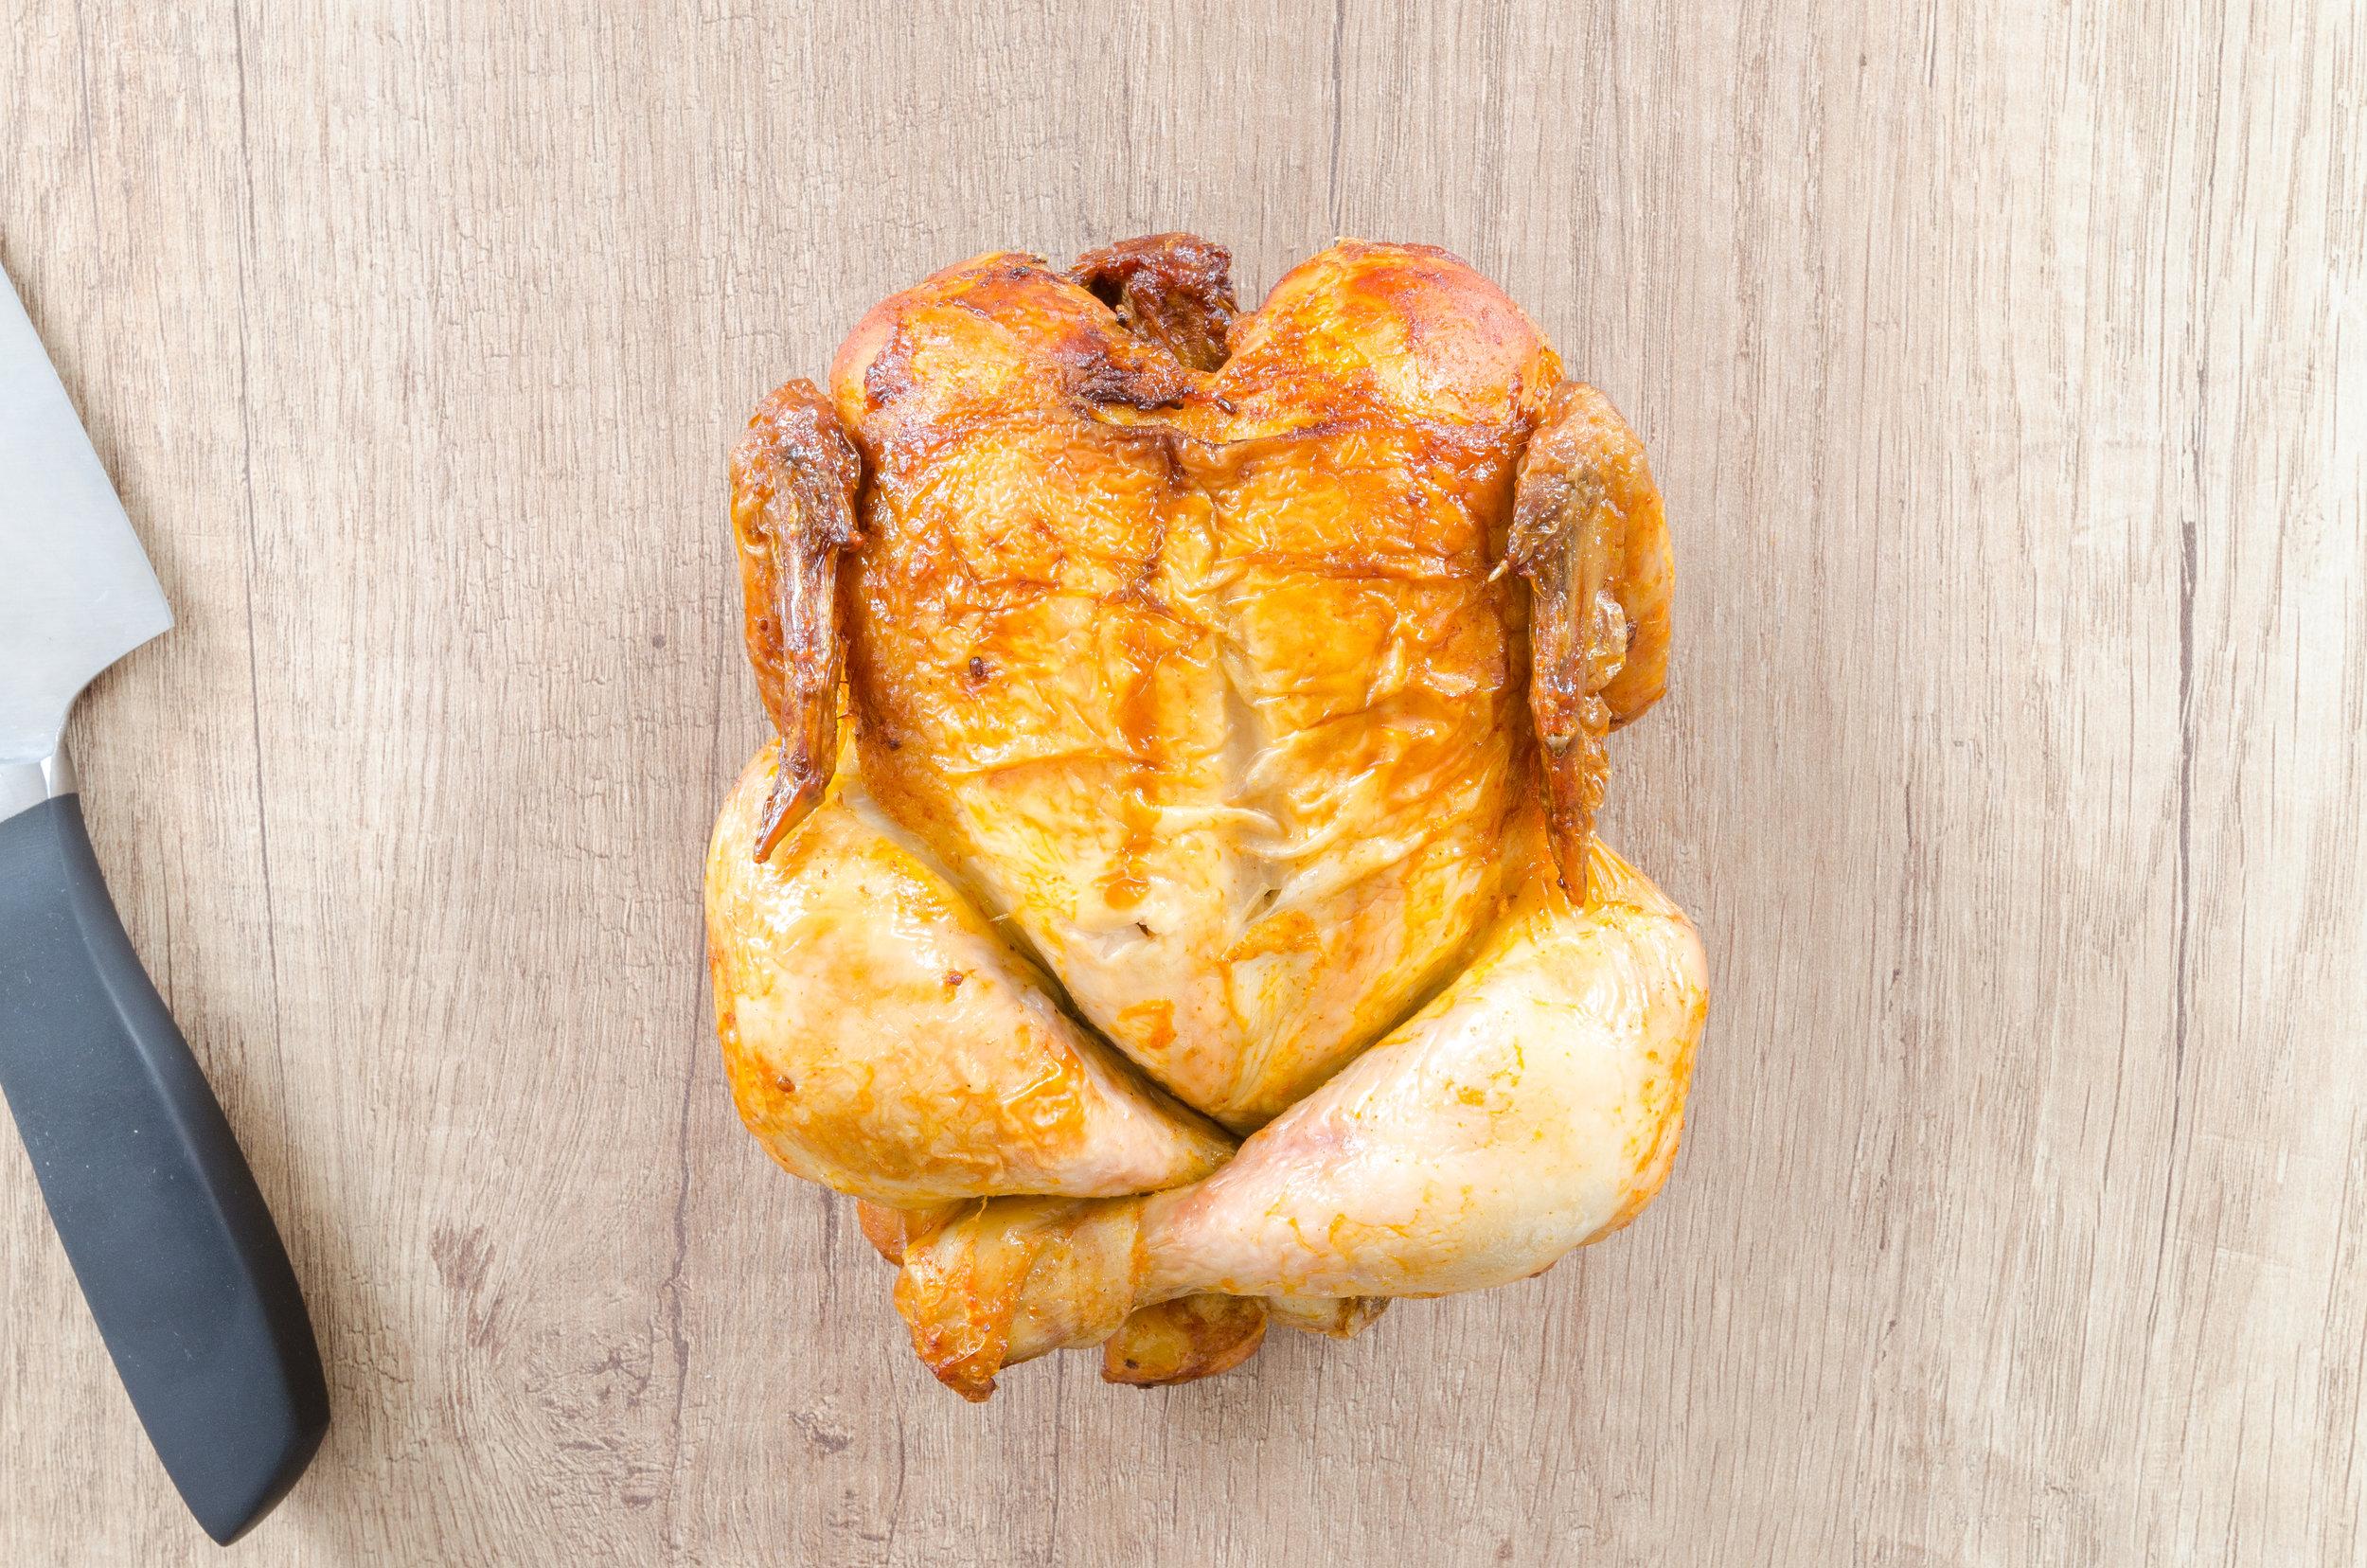 Canva - Tasty Chicken on Wood Table.jpg